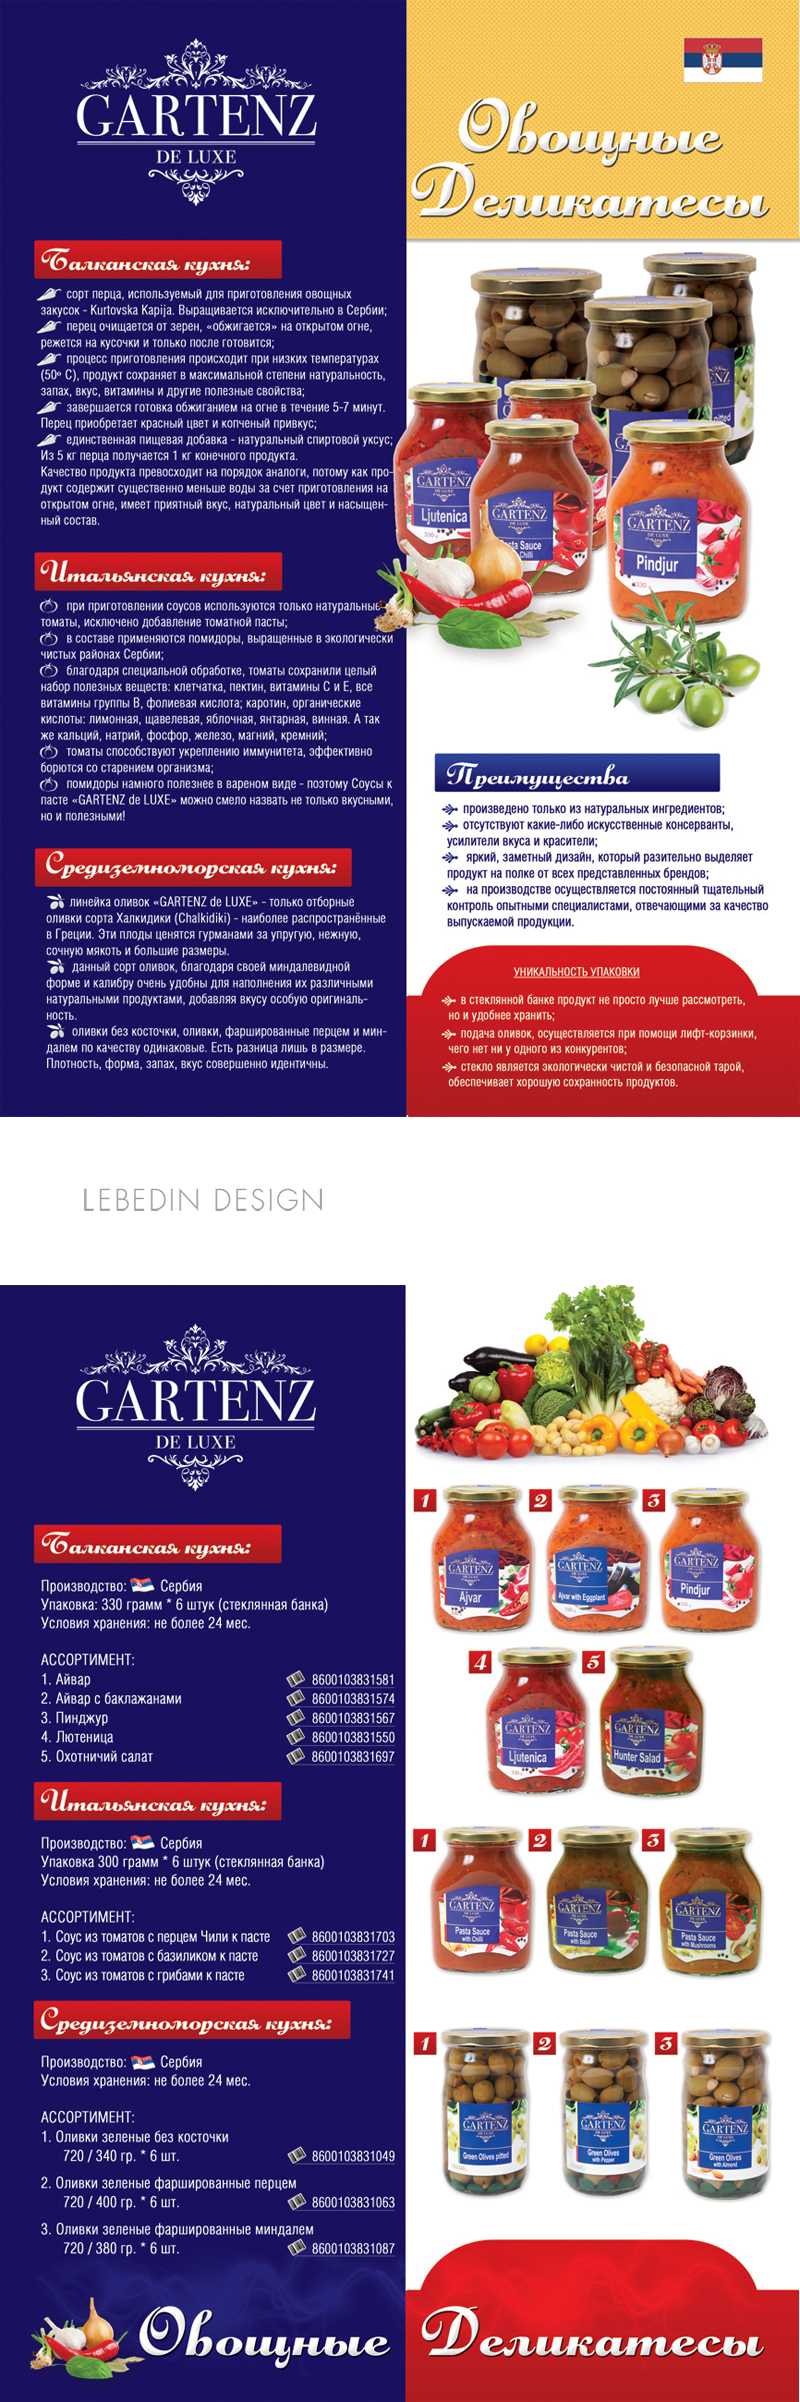 Двусторонняя листовка для Gartenz de Luxe